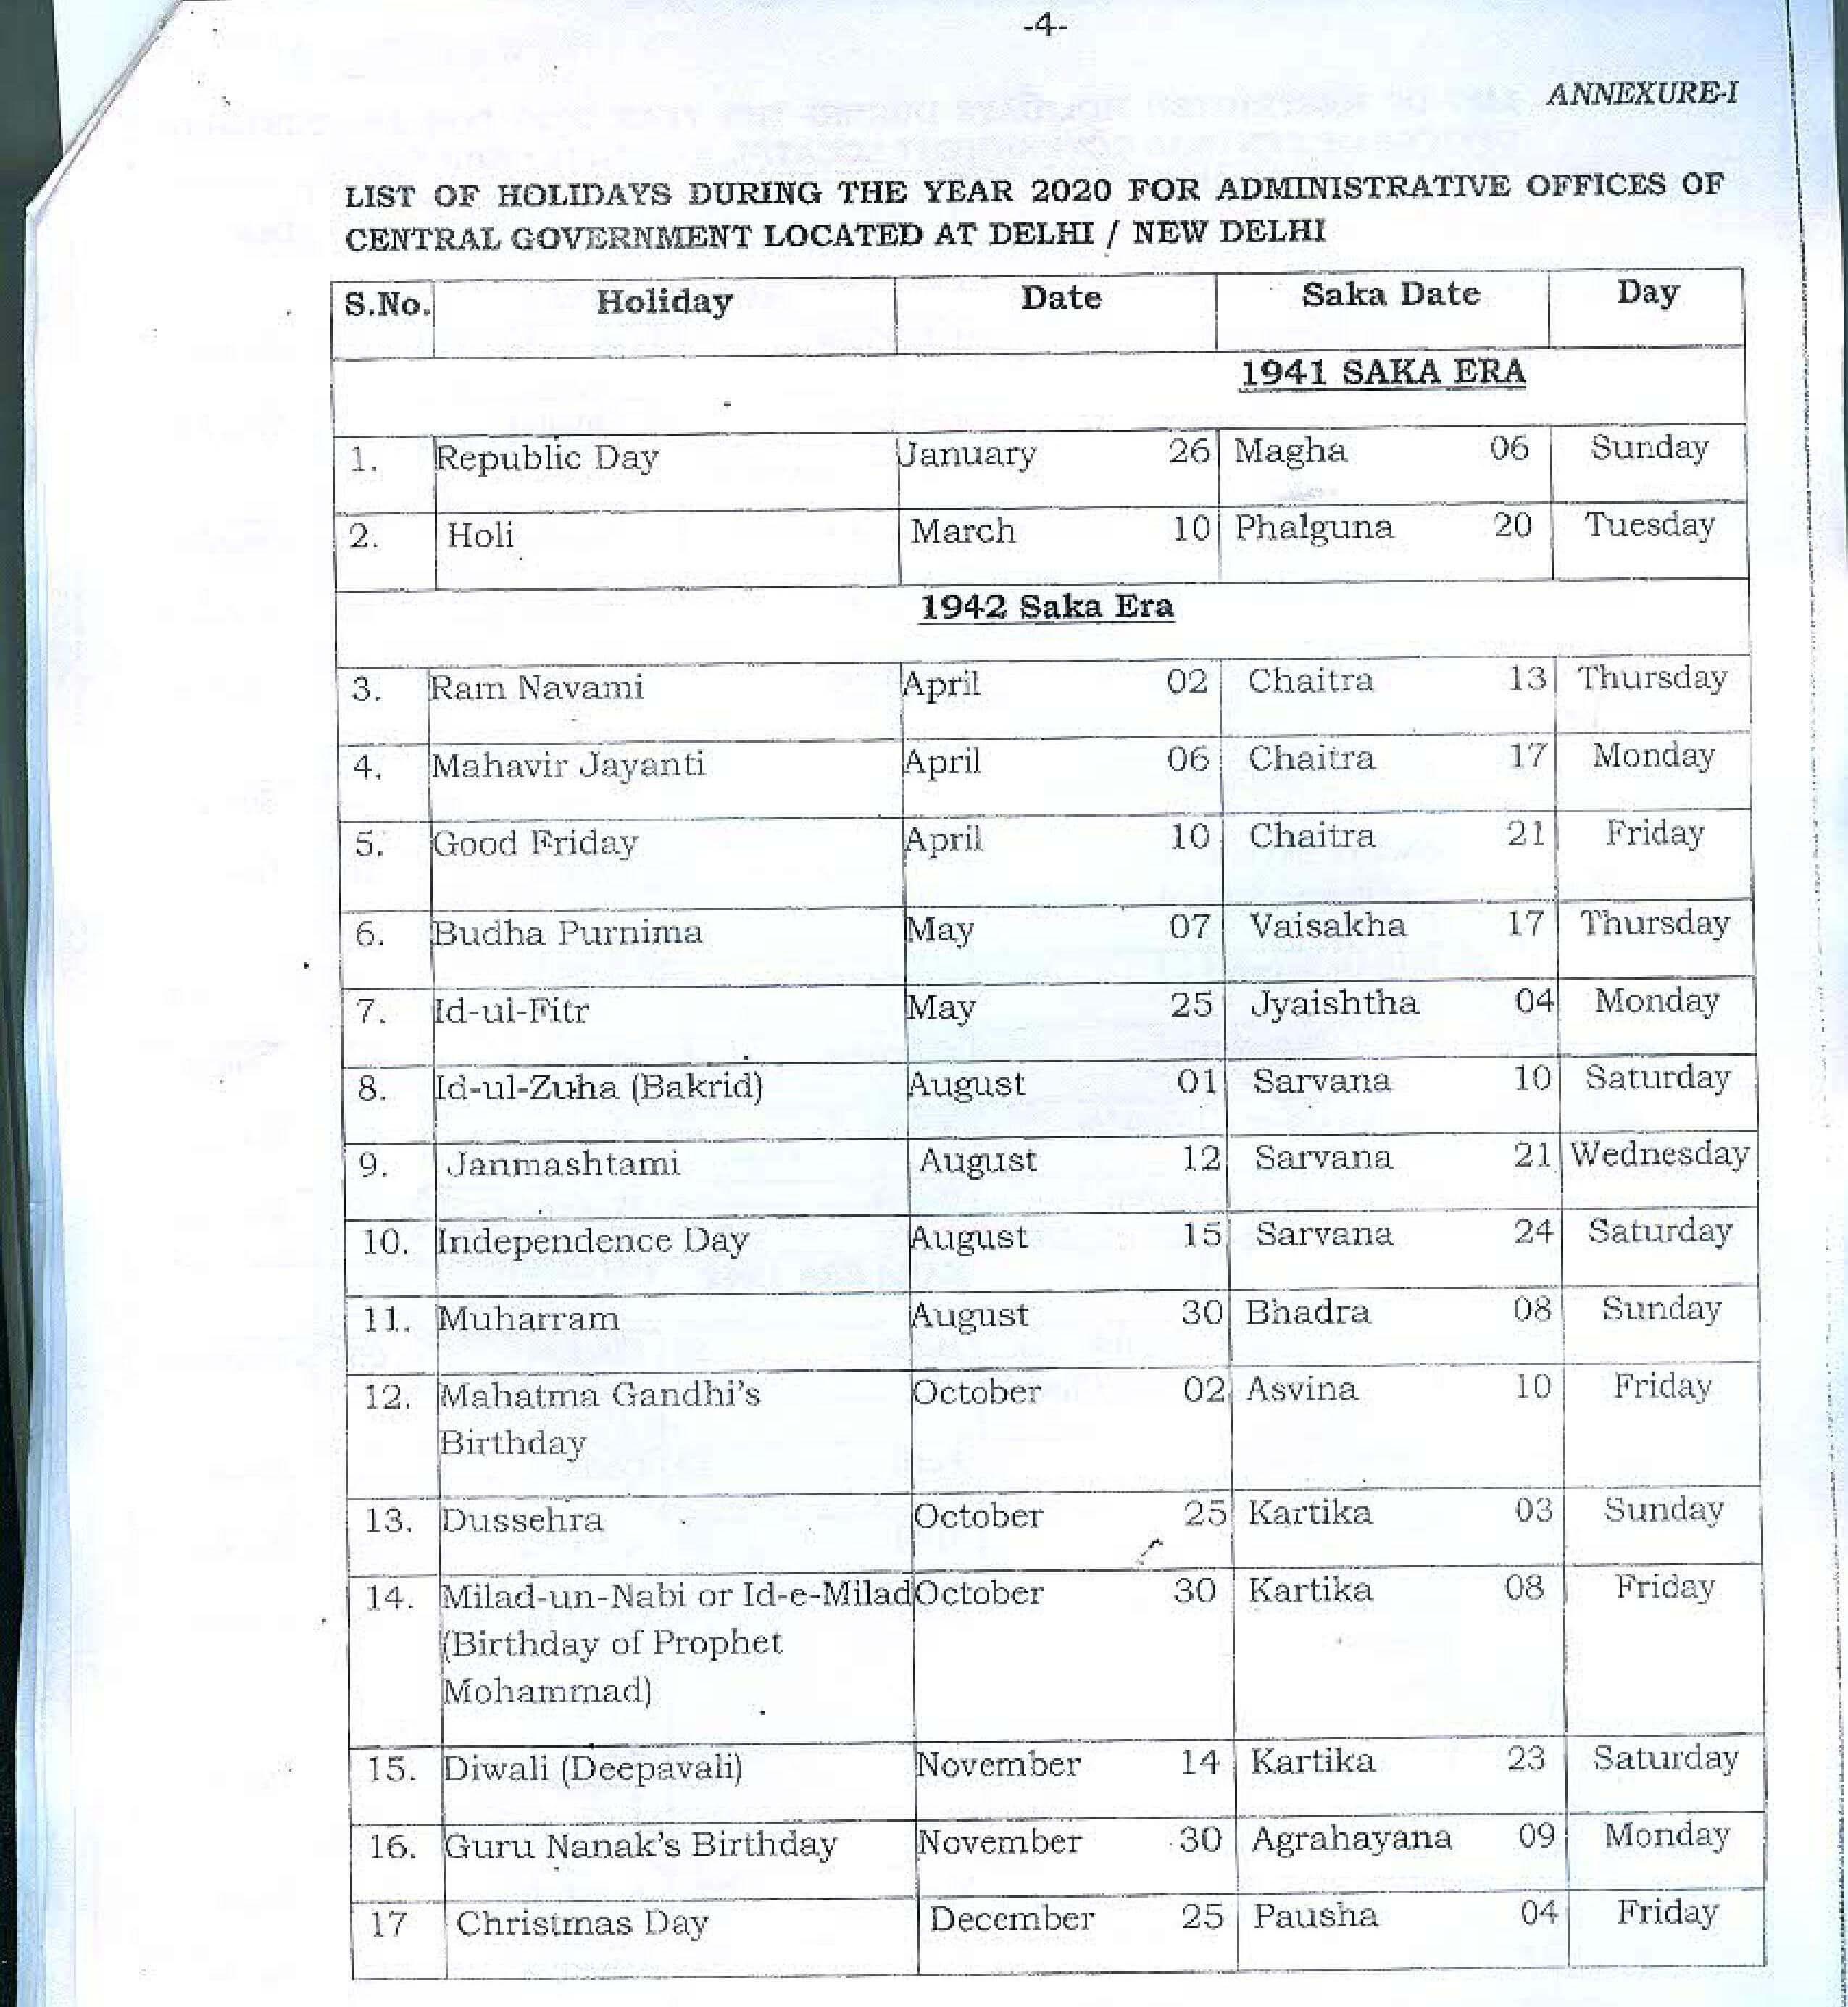 Bsnl Holidays List 2020 | Gazetted And Restricted Holidays intended for Bihar Govt. Calendar 2020